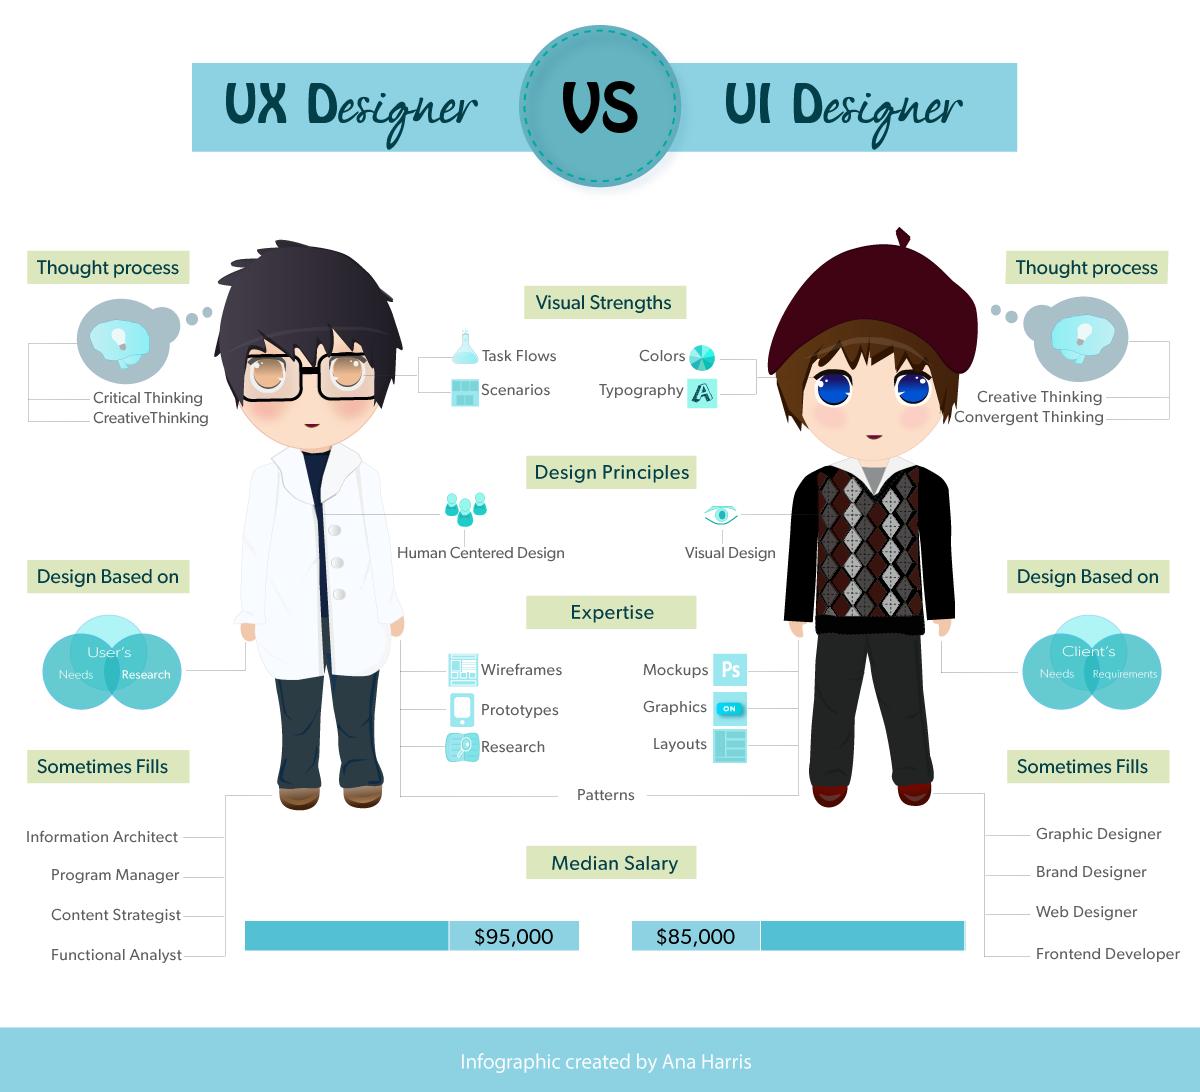 infographic-ux-vs-ui-designer.png